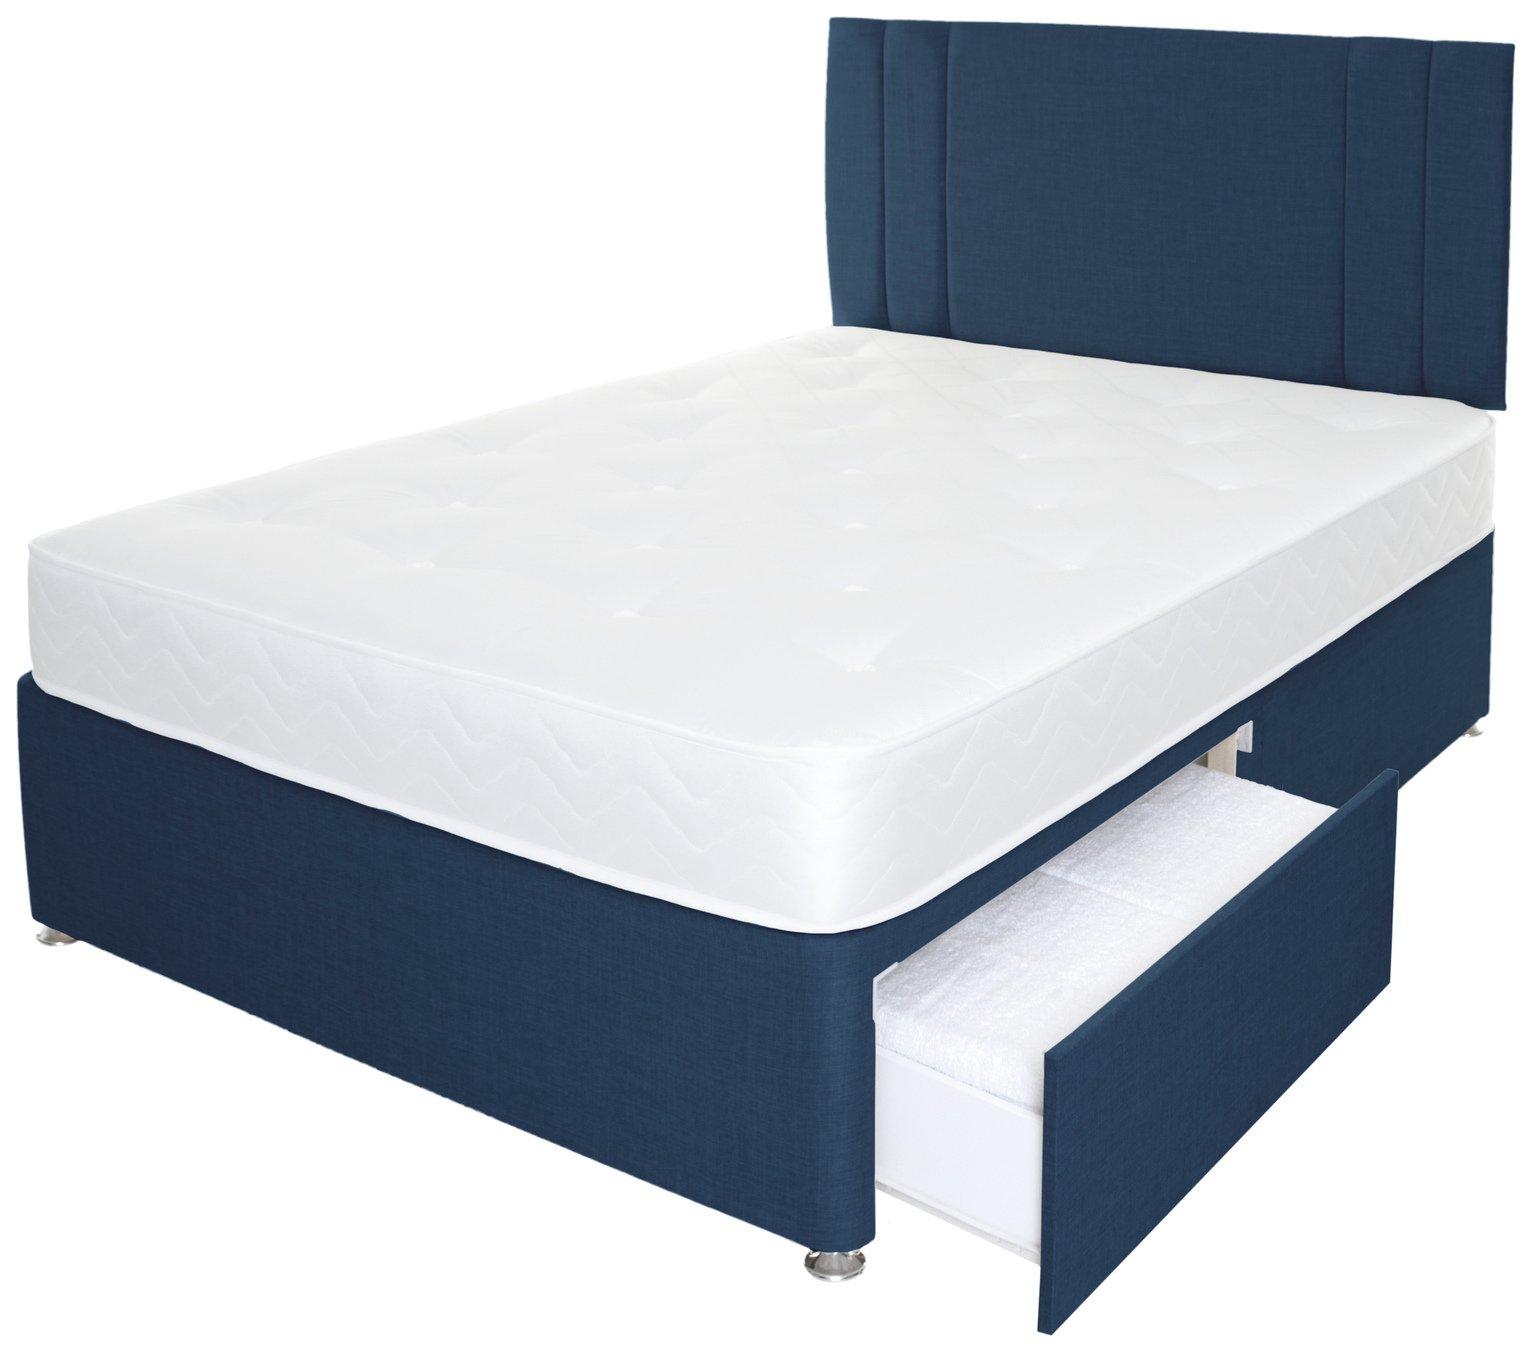 Airpsrung Henlow 1200 Pkt 2 Drw Divan Bed & Headboard - Blue at Argos